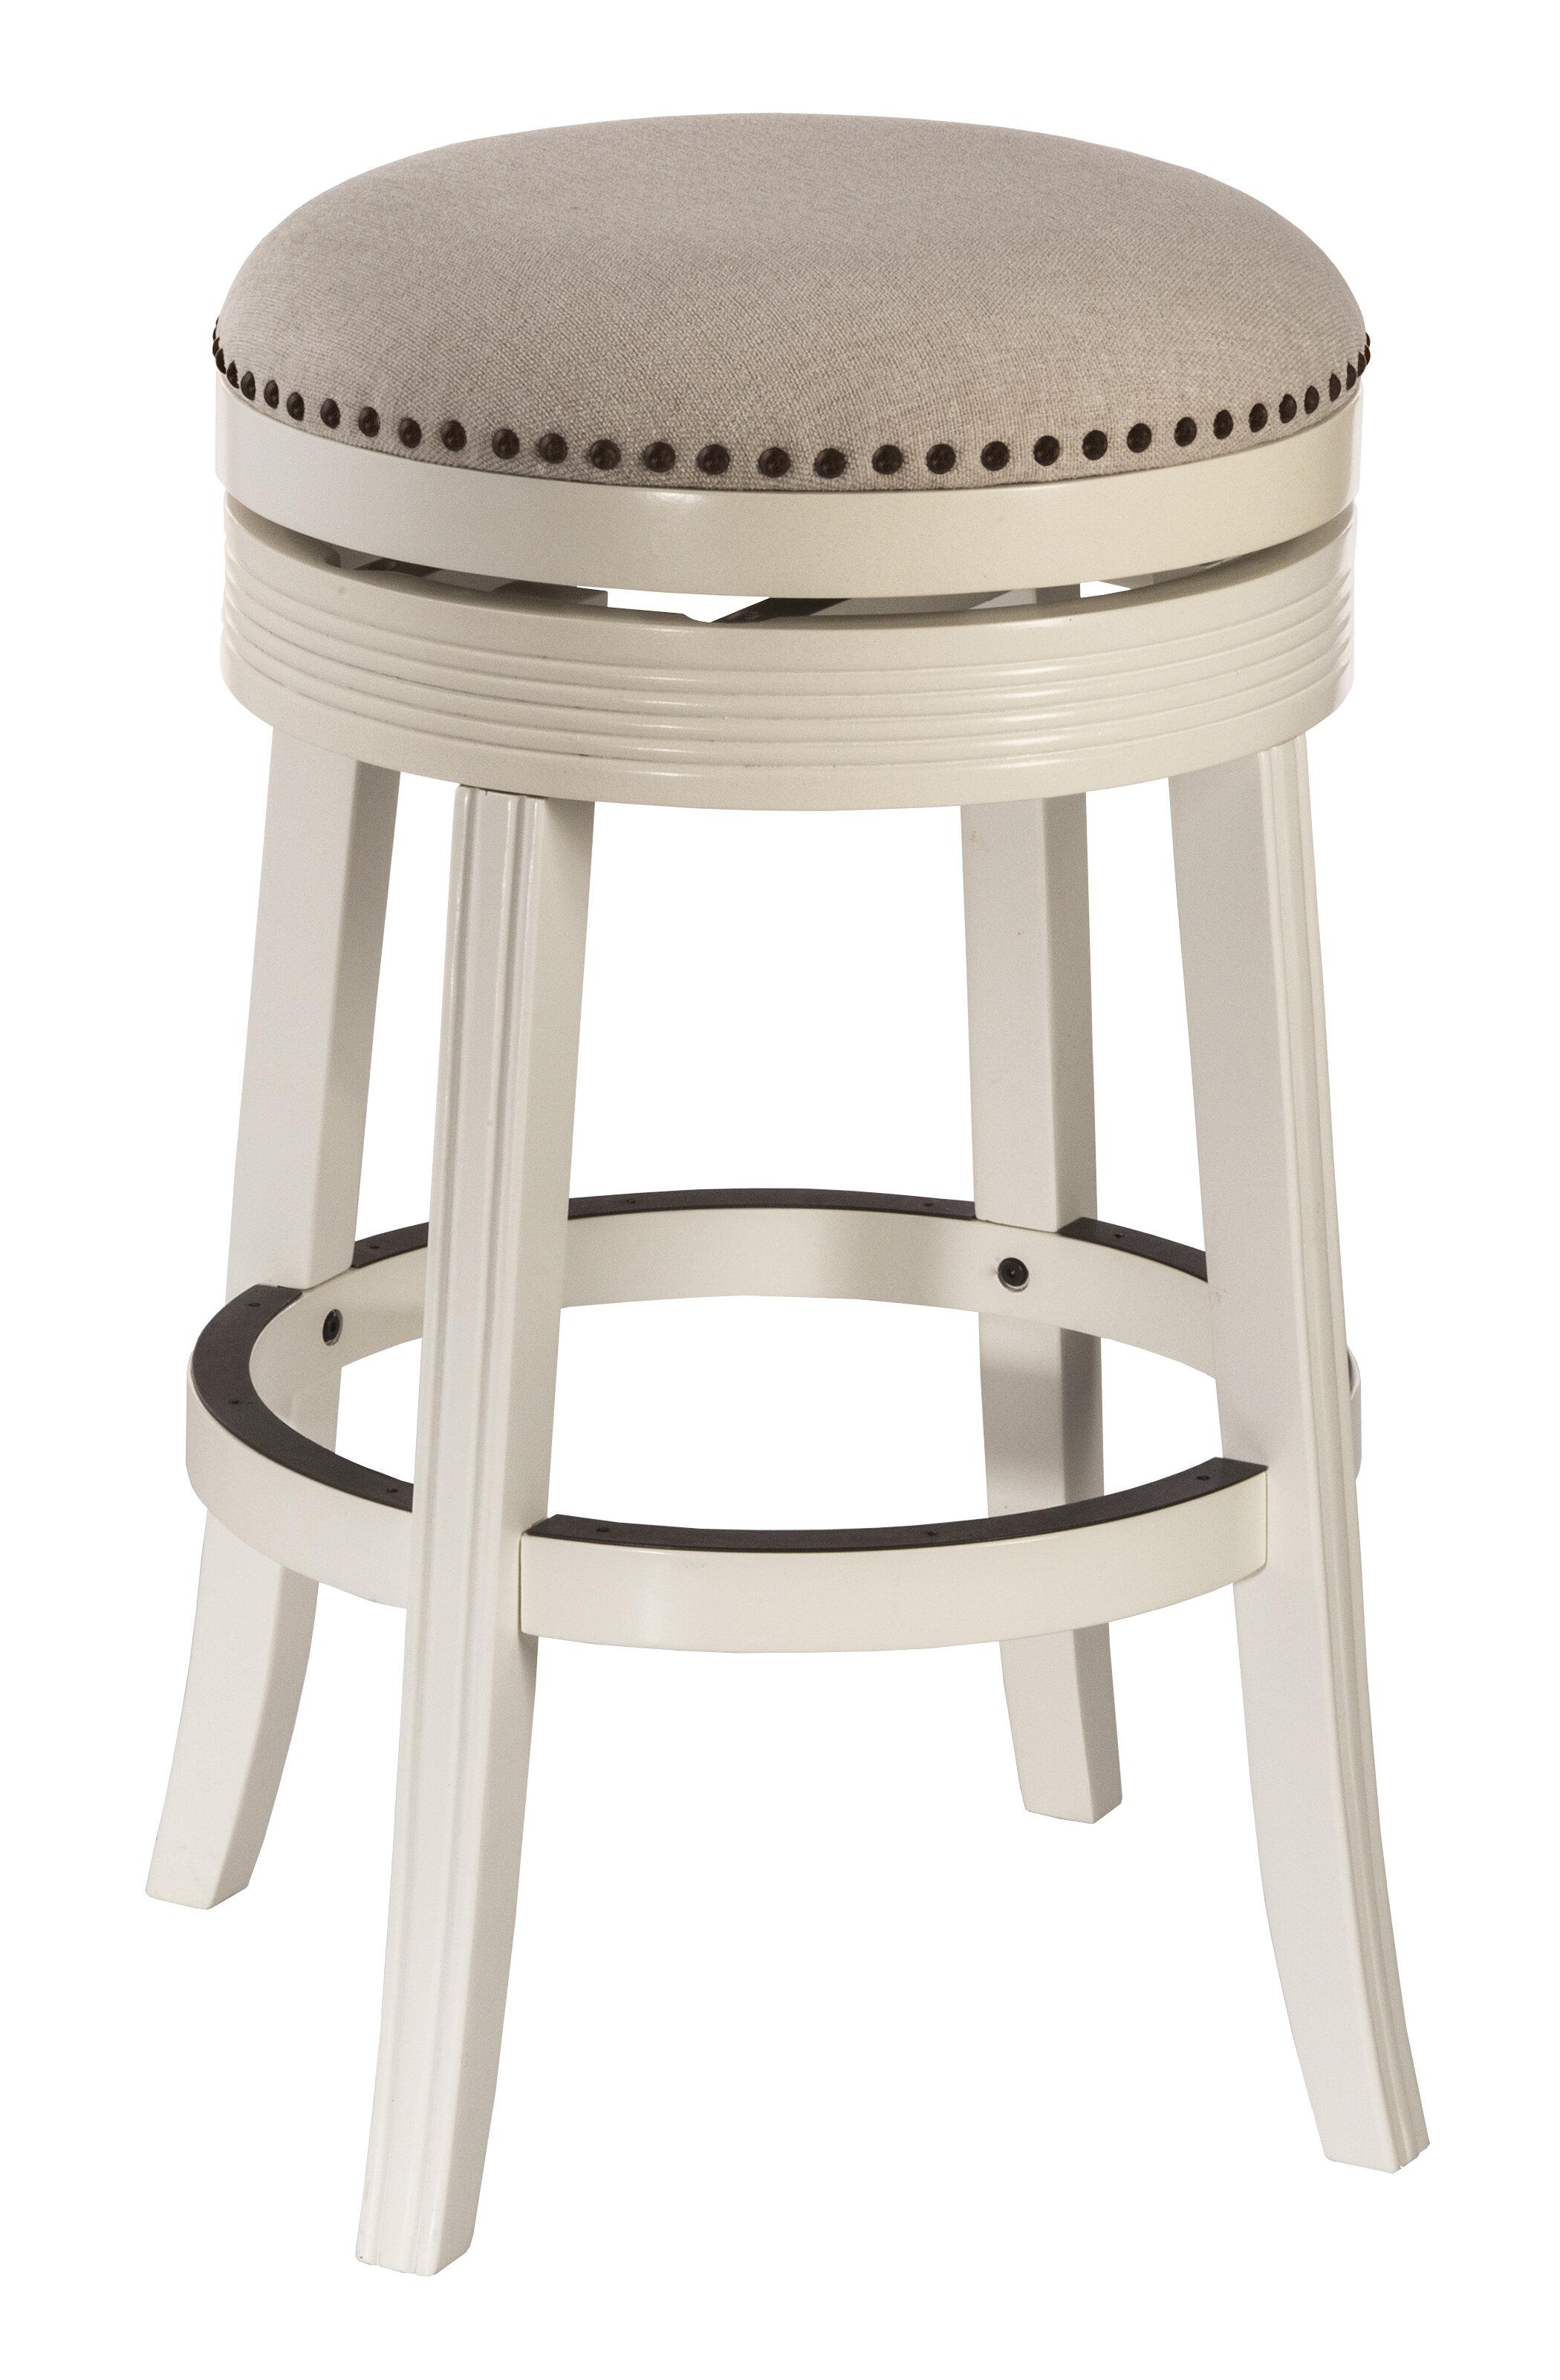 Peachy Stolz 30 Swivel Bar Stool Bralicious Painted Fabric Chair Ideas Braliciousco